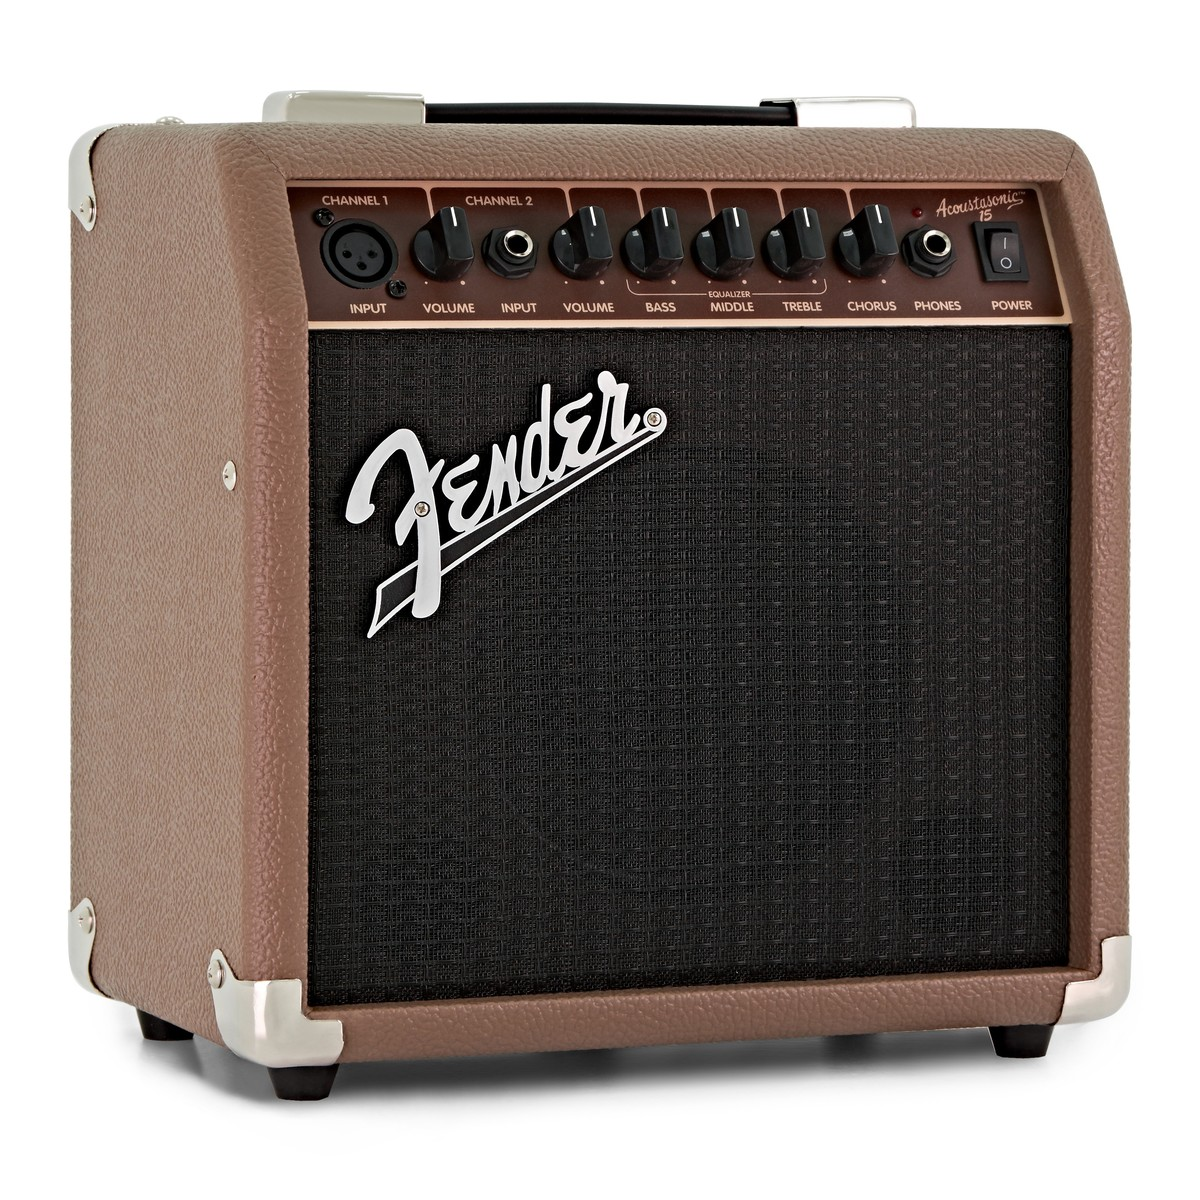 Fender Acoustasonic 40 Verstärker Combo für Akustikgitarre 40 Watt mit XLR Input